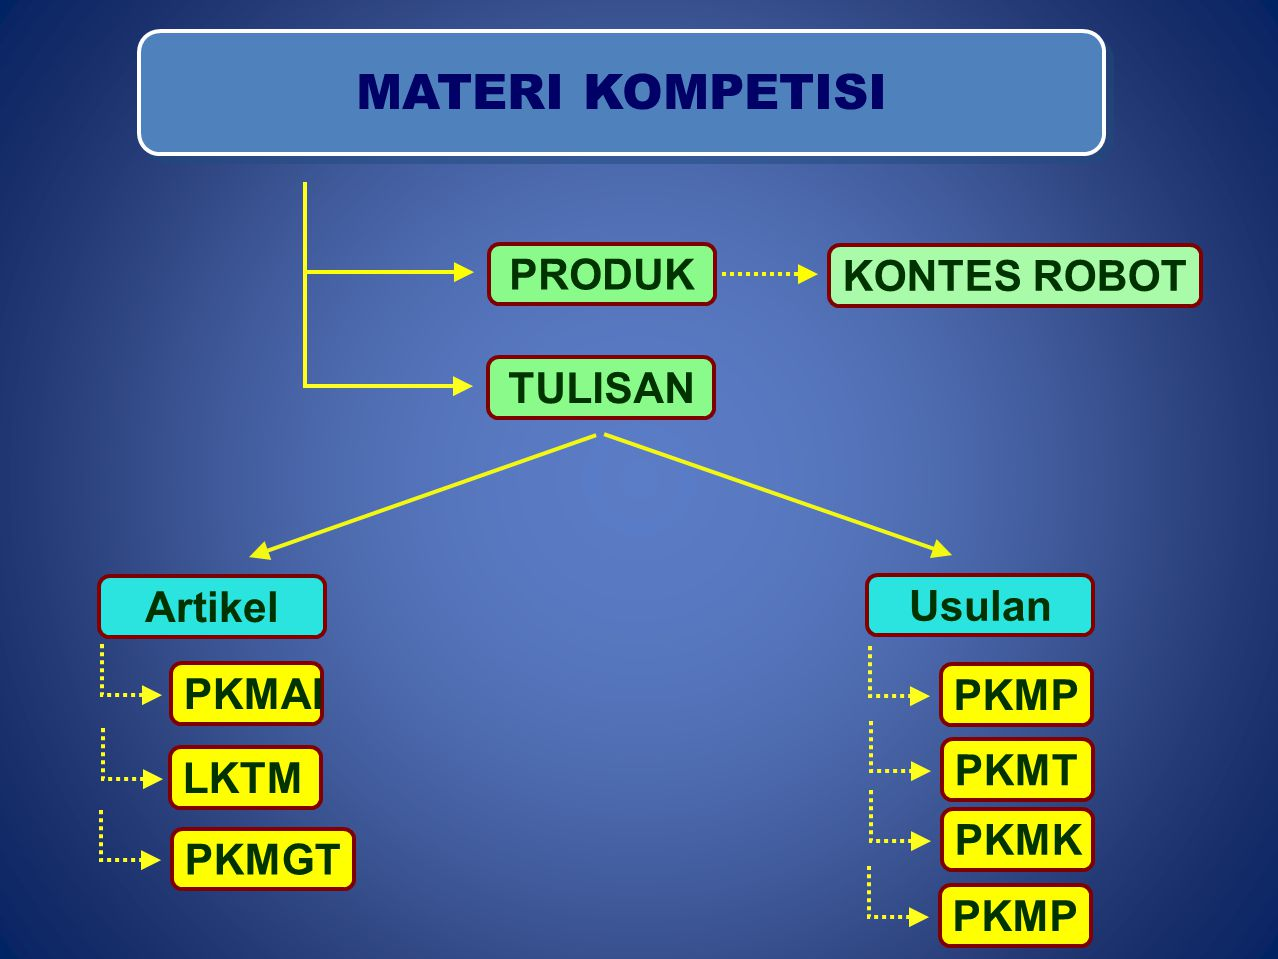 MATERI KOMPETISI TULISAN KONTES ROBOT PRODUK Usulan Artikel PKMP PKMT PKMK PKMP PKMAI LKTM PKMGT